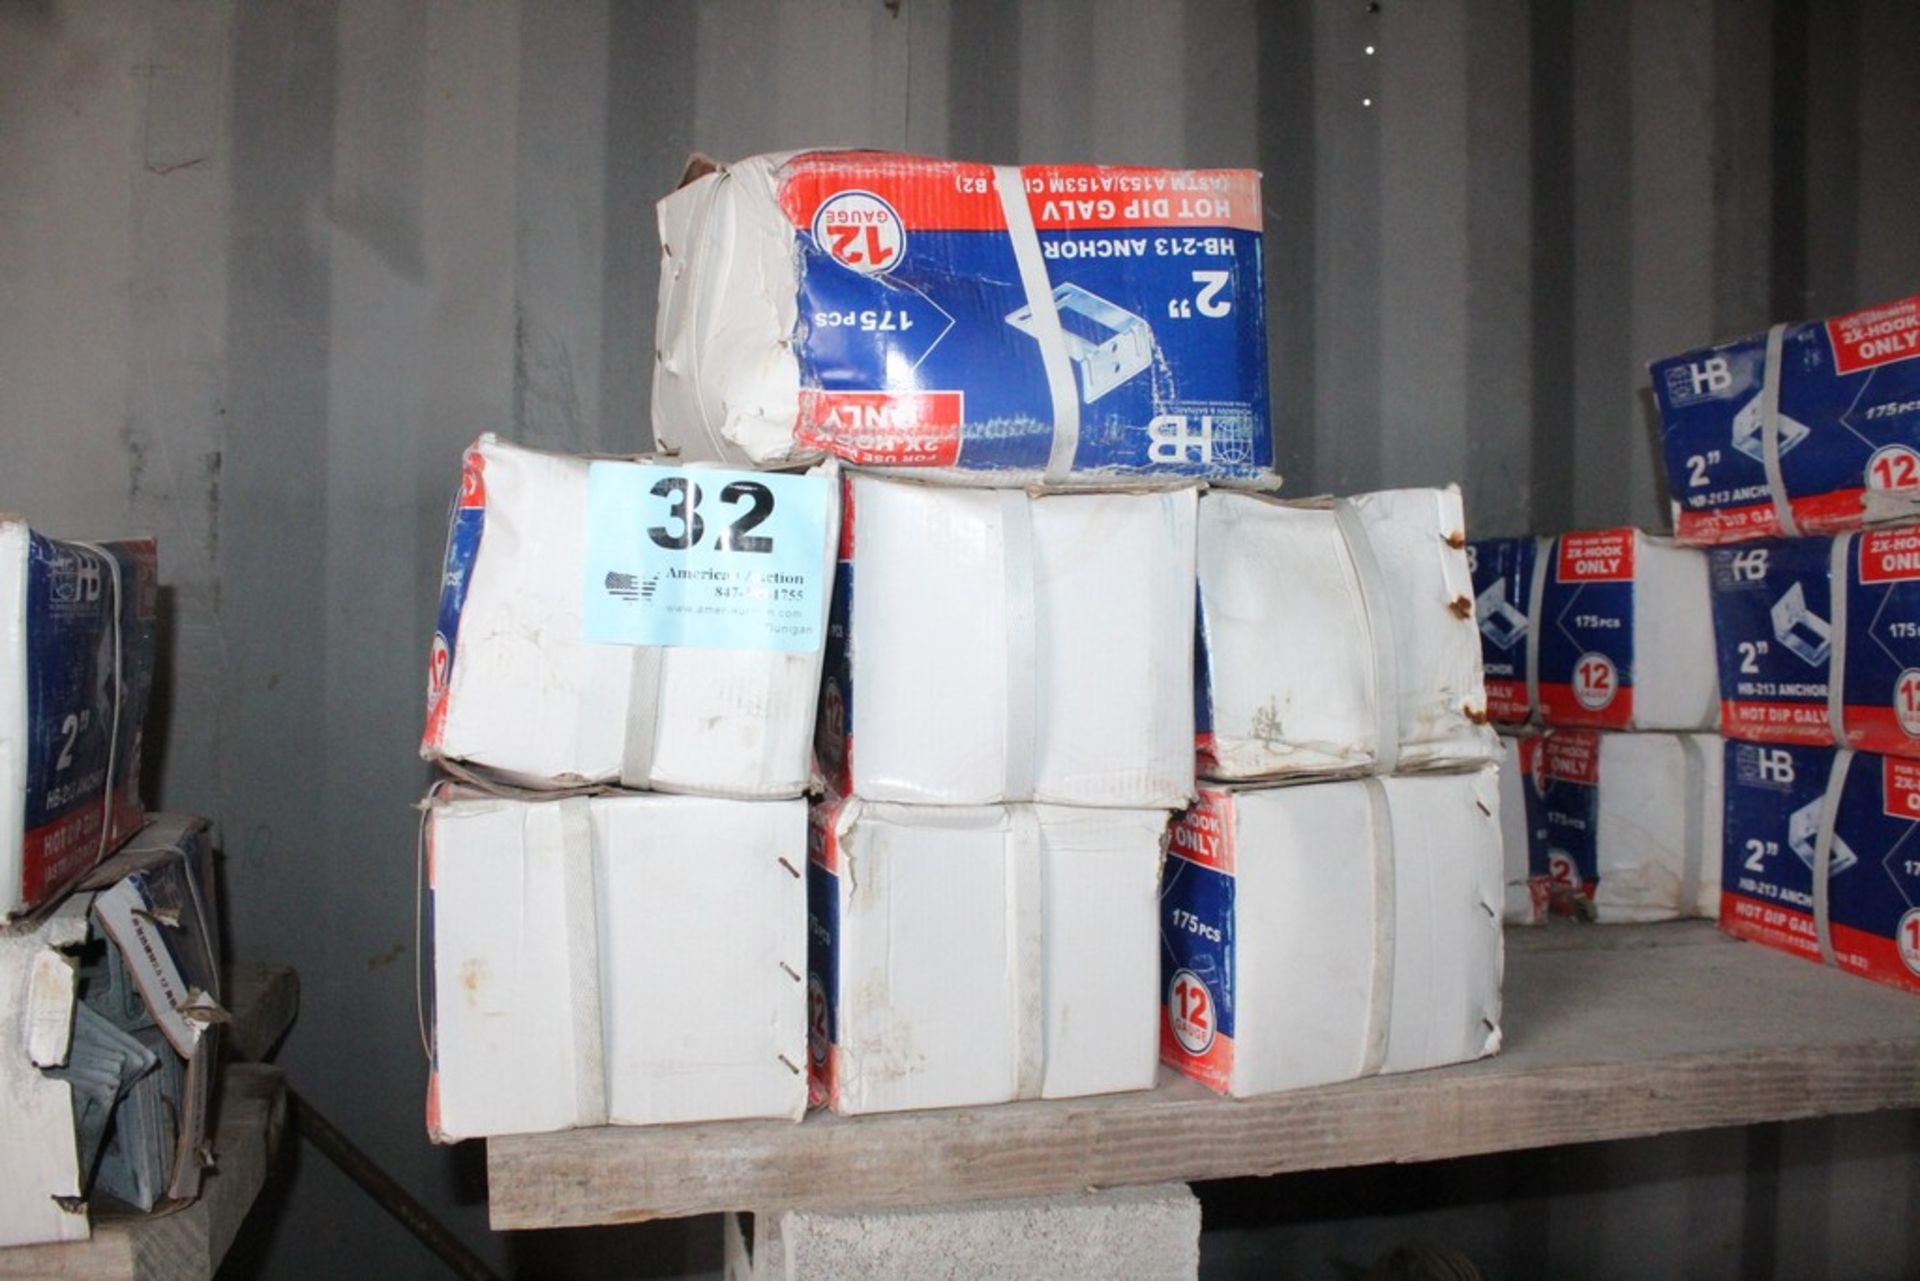 "Lot 32 - (9) BOXES OF HOHMANN & BARNARD HB 213 2"" ADJUSTABLE VENEER ANCHORS 175 PER BOX"